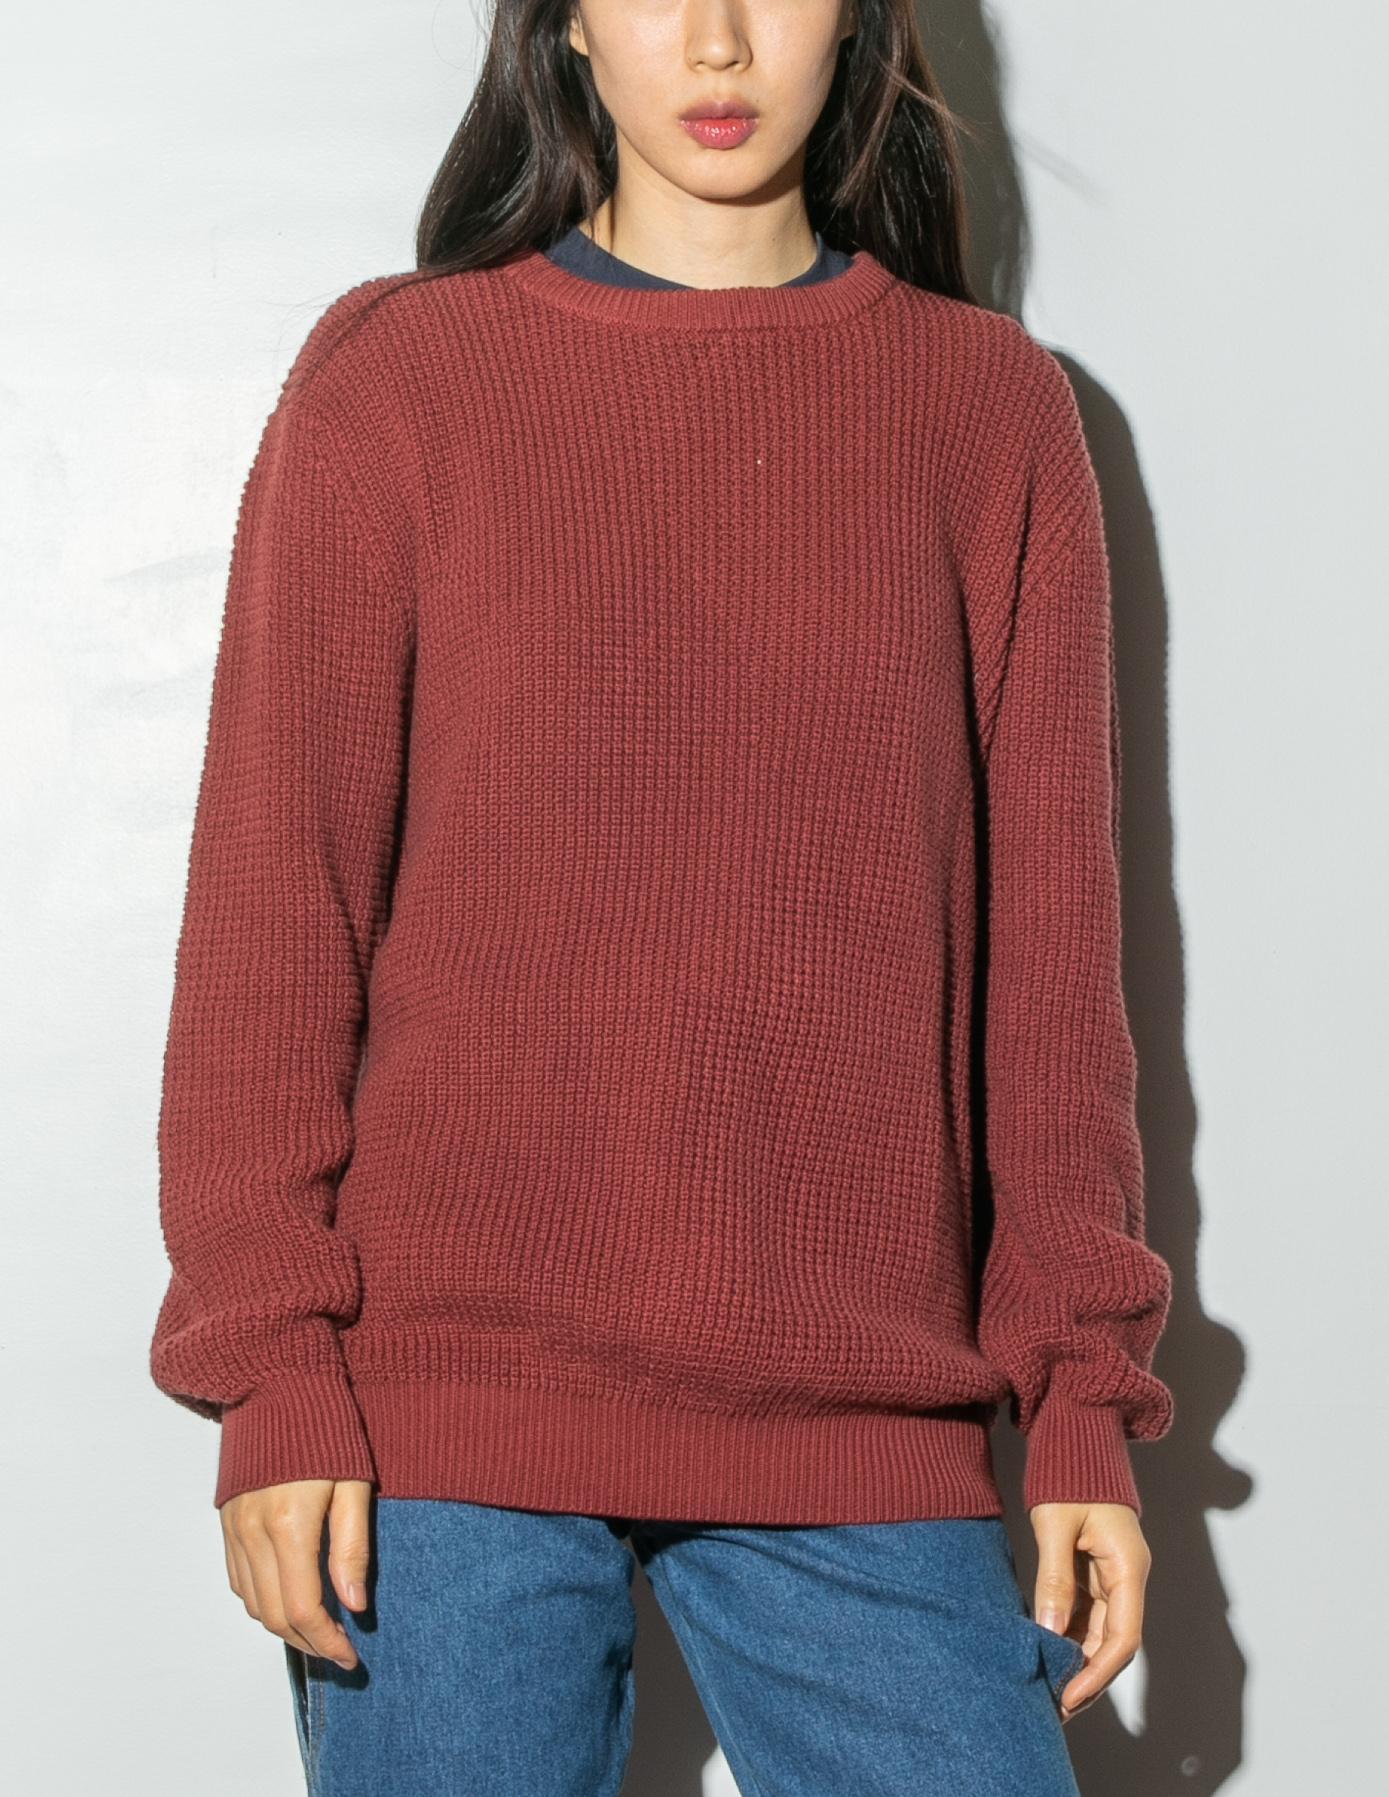 a83a40b2f494 Lyst - OAK Long Crewneck Sweater - Burnt Orange in Red for Men